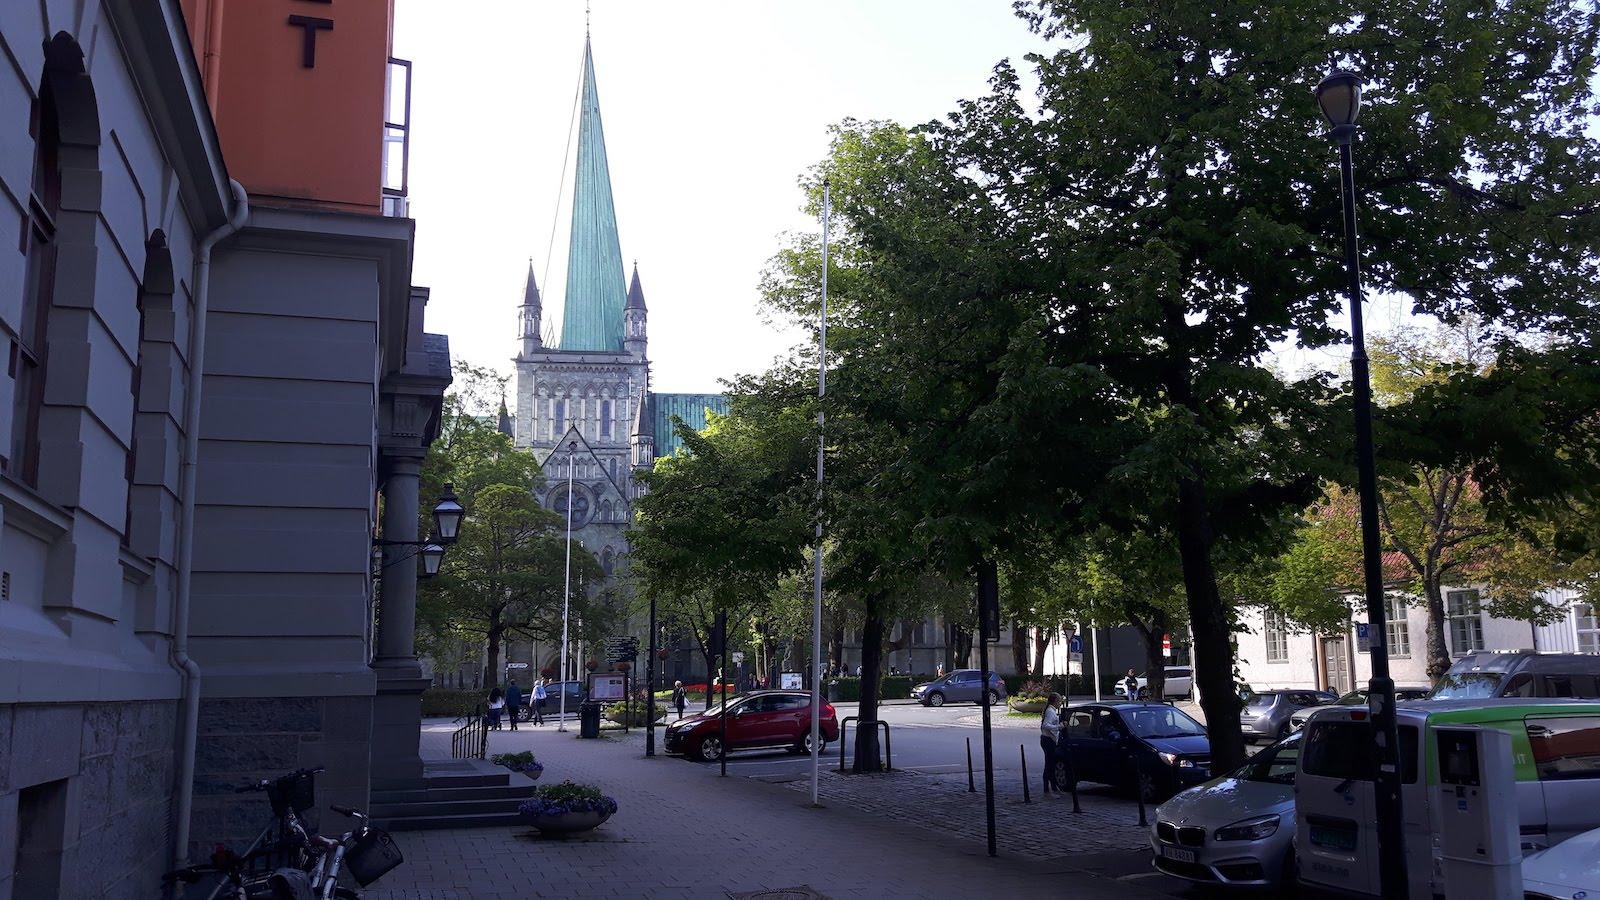 Another Street in Trondheim